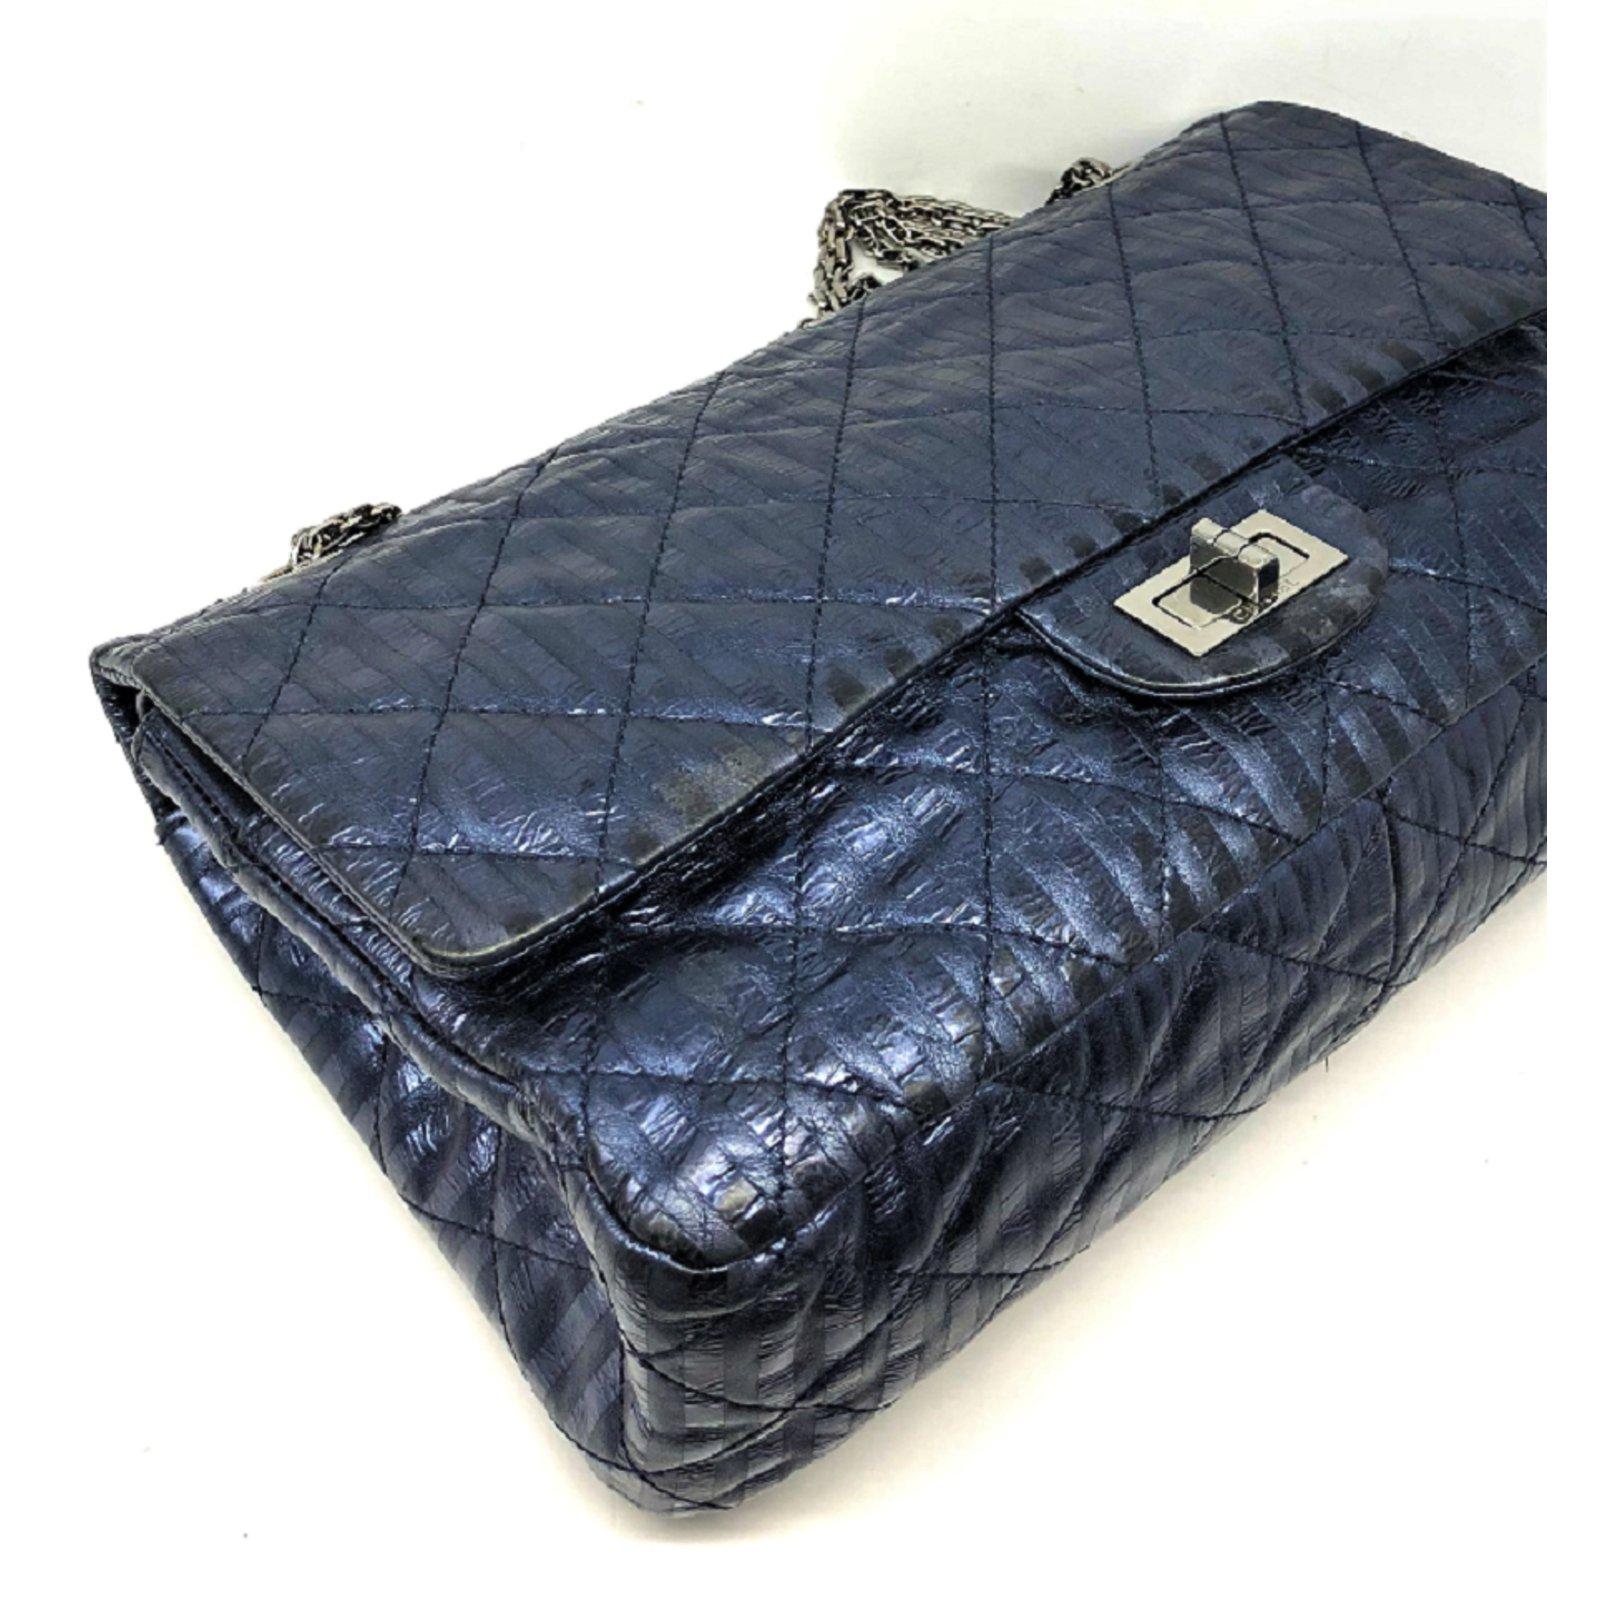 eb756fa045ea47 Chanel Chanel 2.55 stripped metallic navy blue reissue lined flap bag  Handbags Leather Blue ref.80037 - Joli Closet